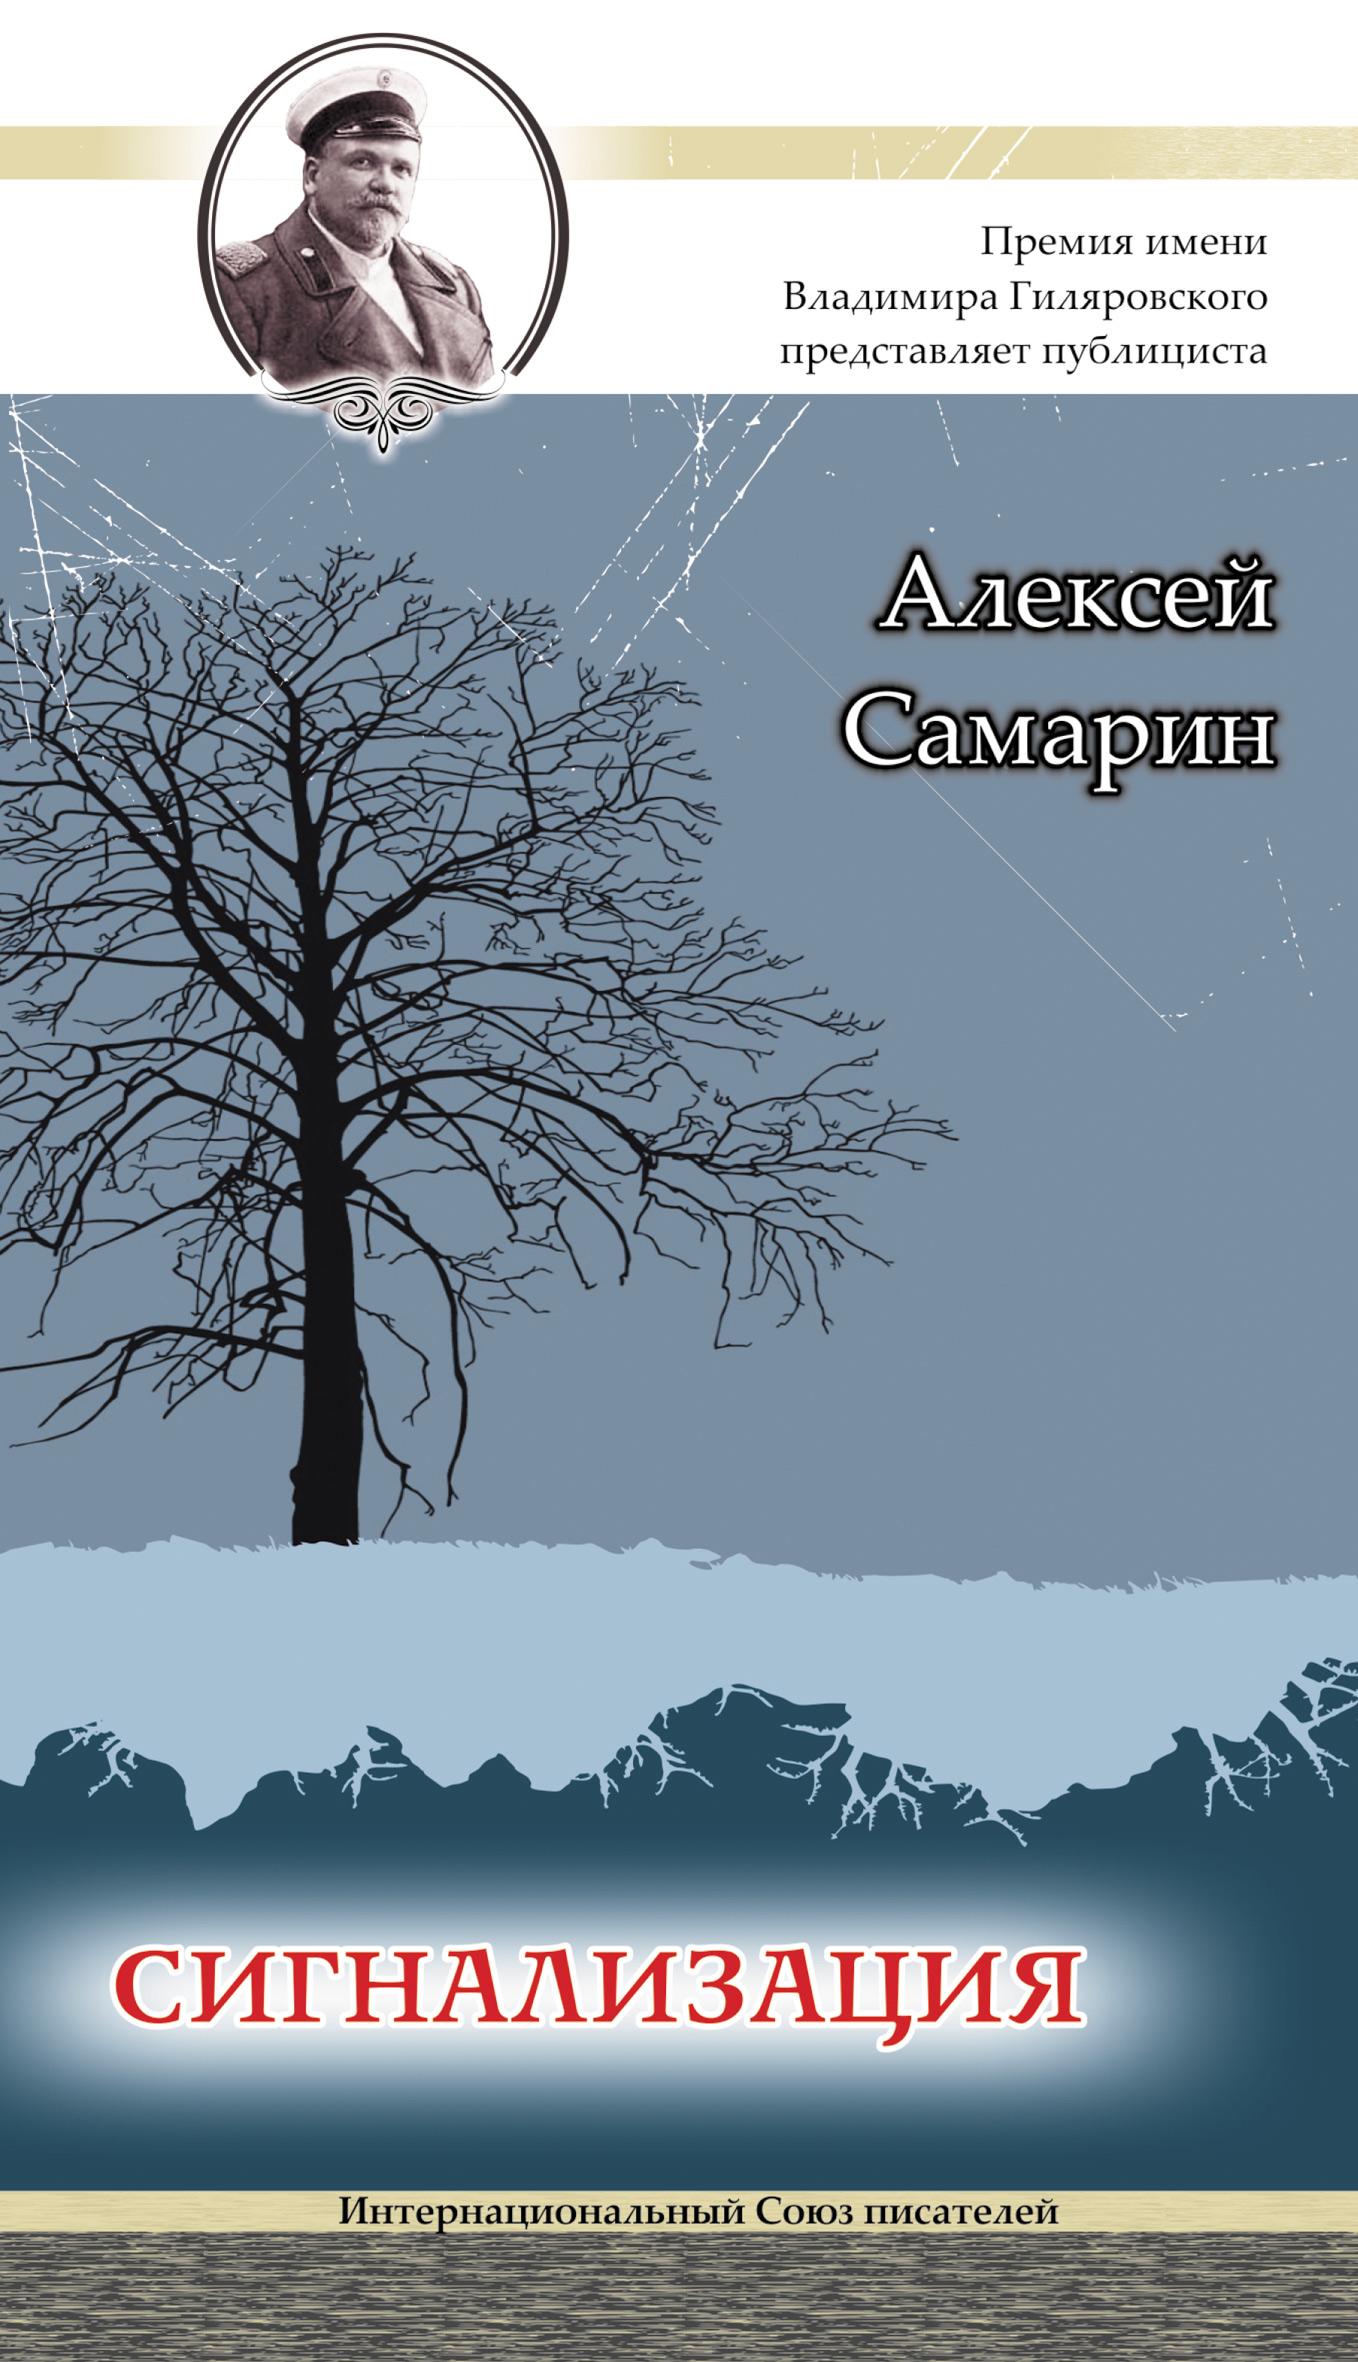 Алексей Самарин Сигнализация